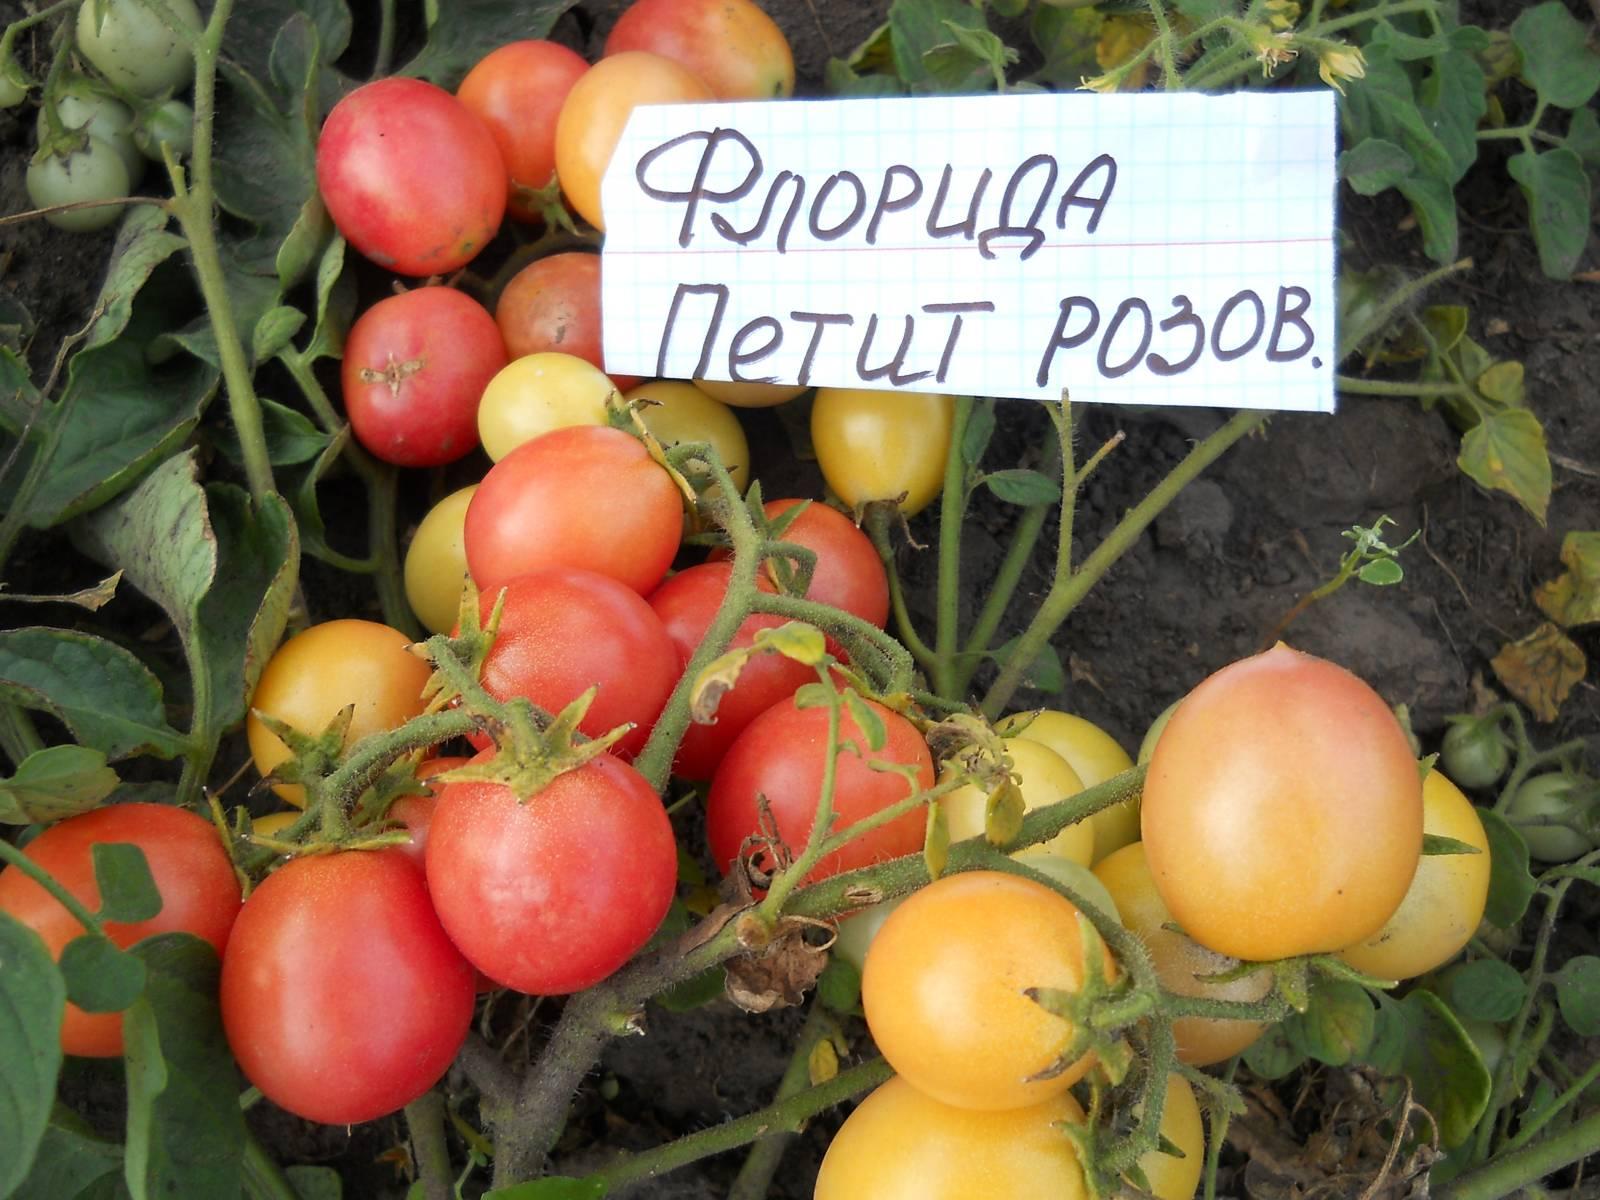 florida-petite-seed